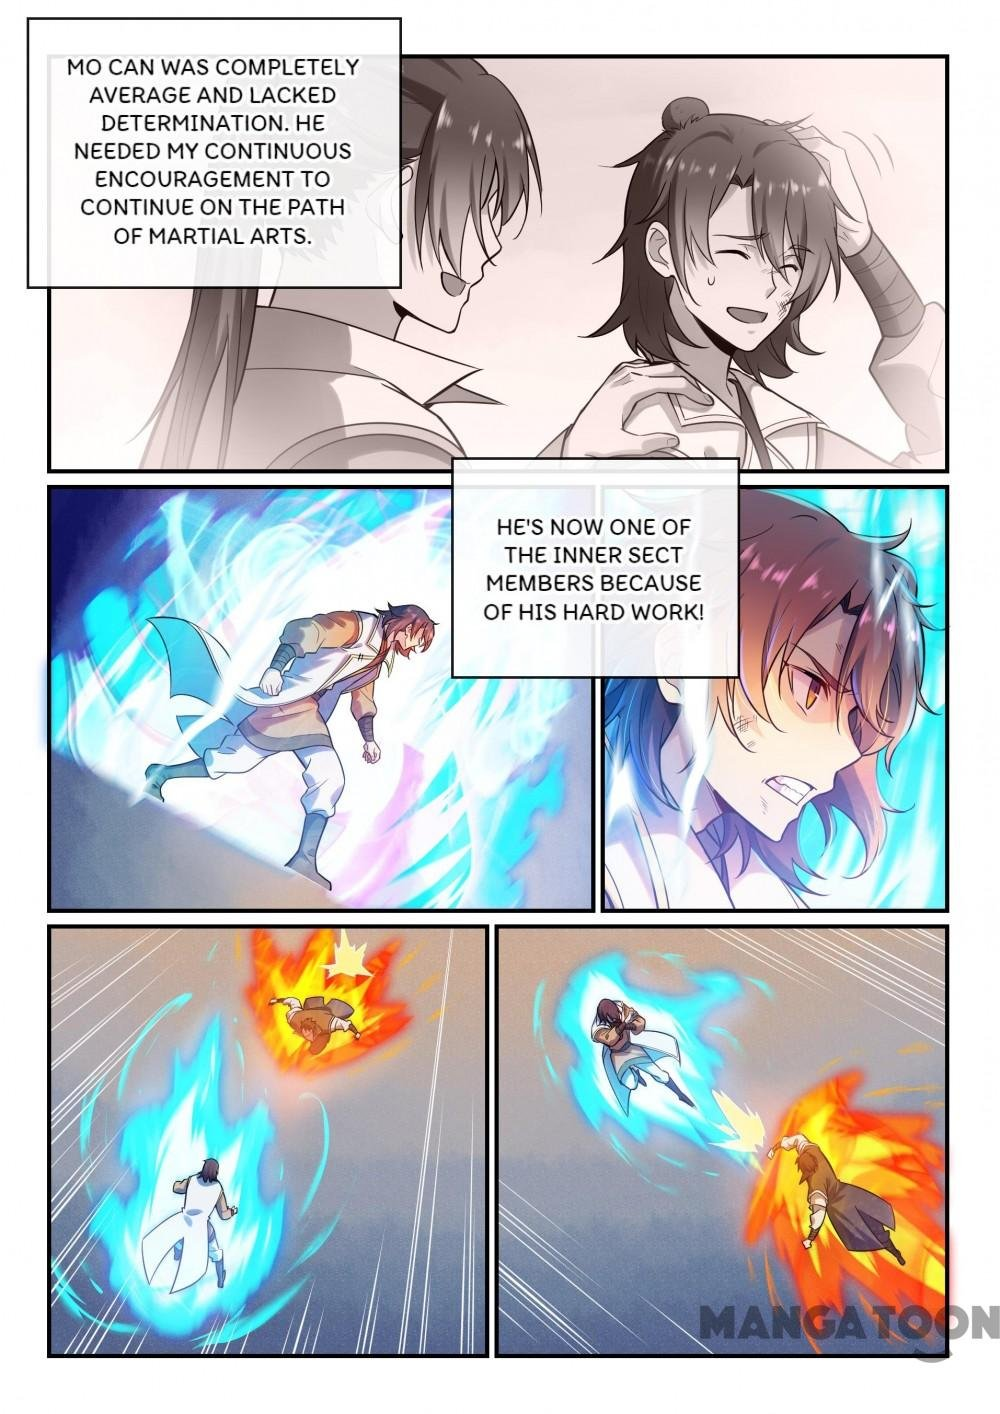 Manga Apotheosis - Chapter 483 Page 4